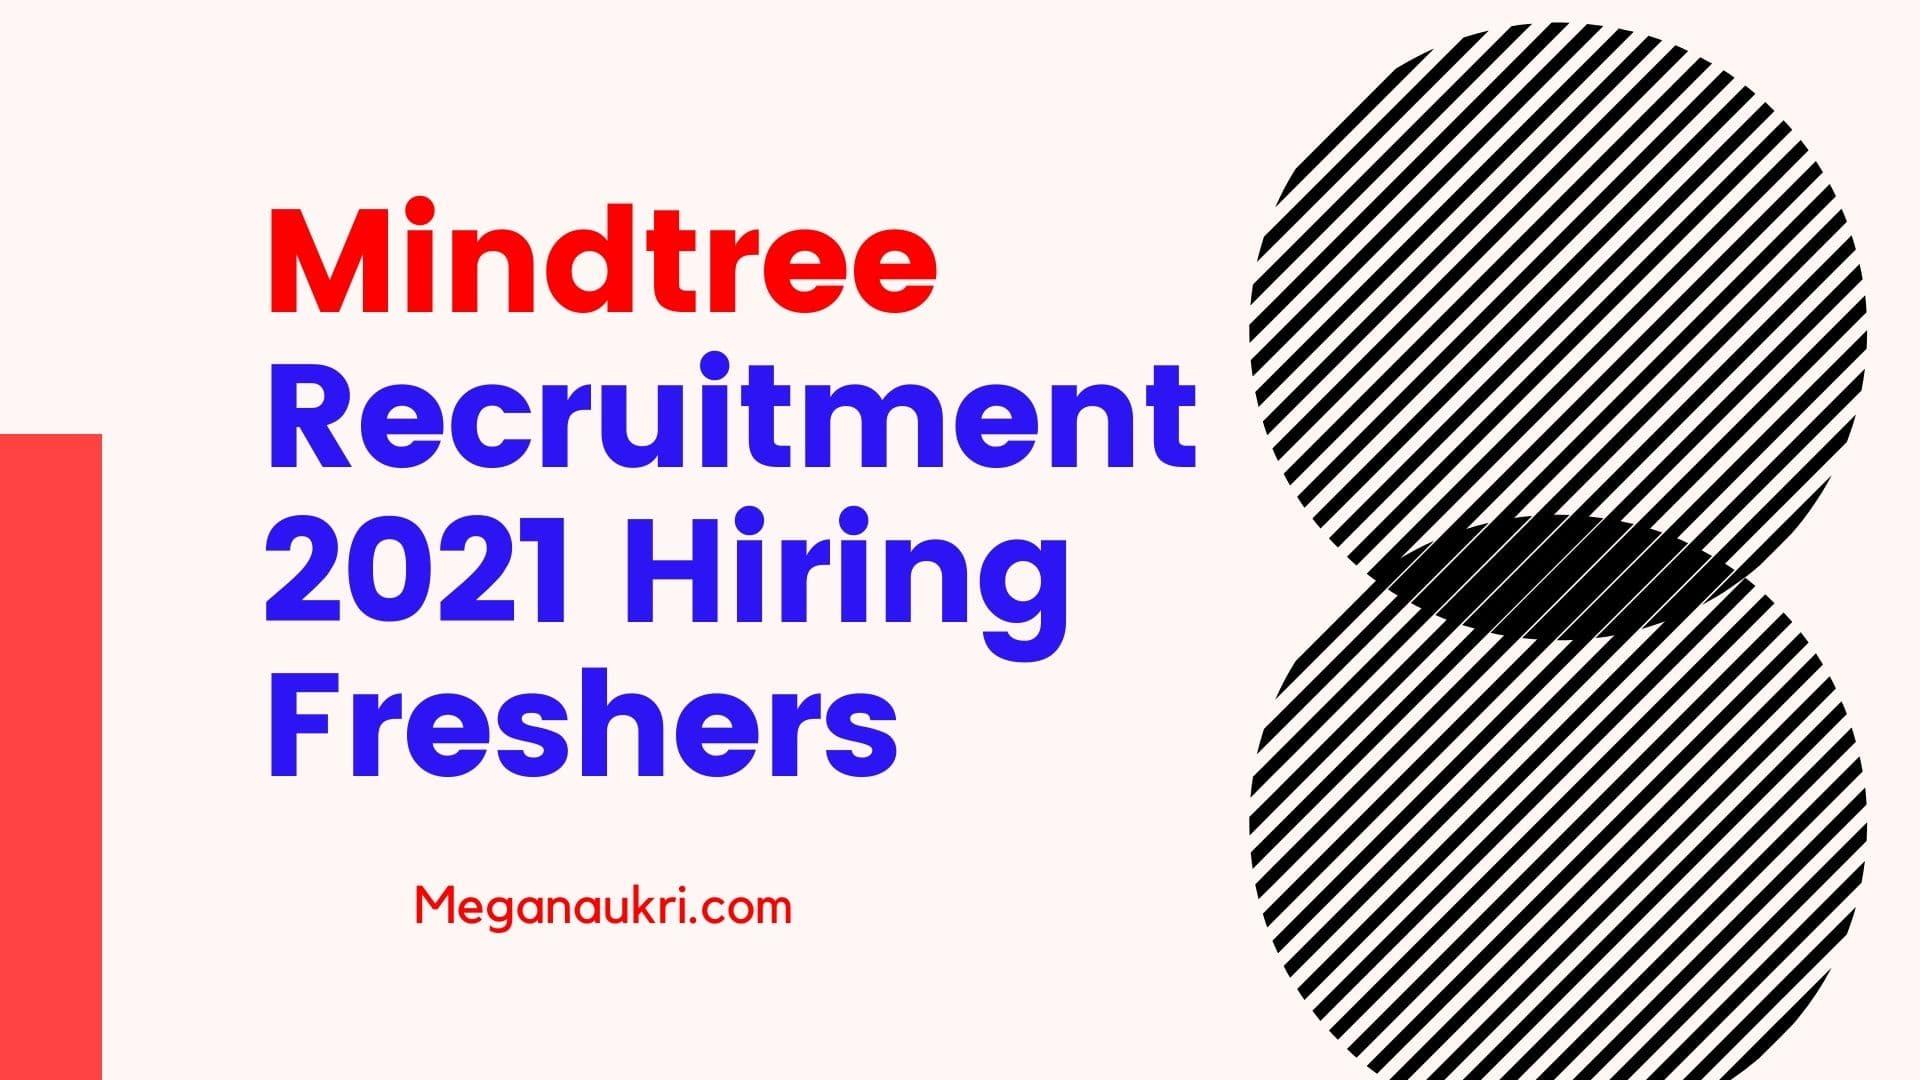 Mindtree-Recruitment-2021